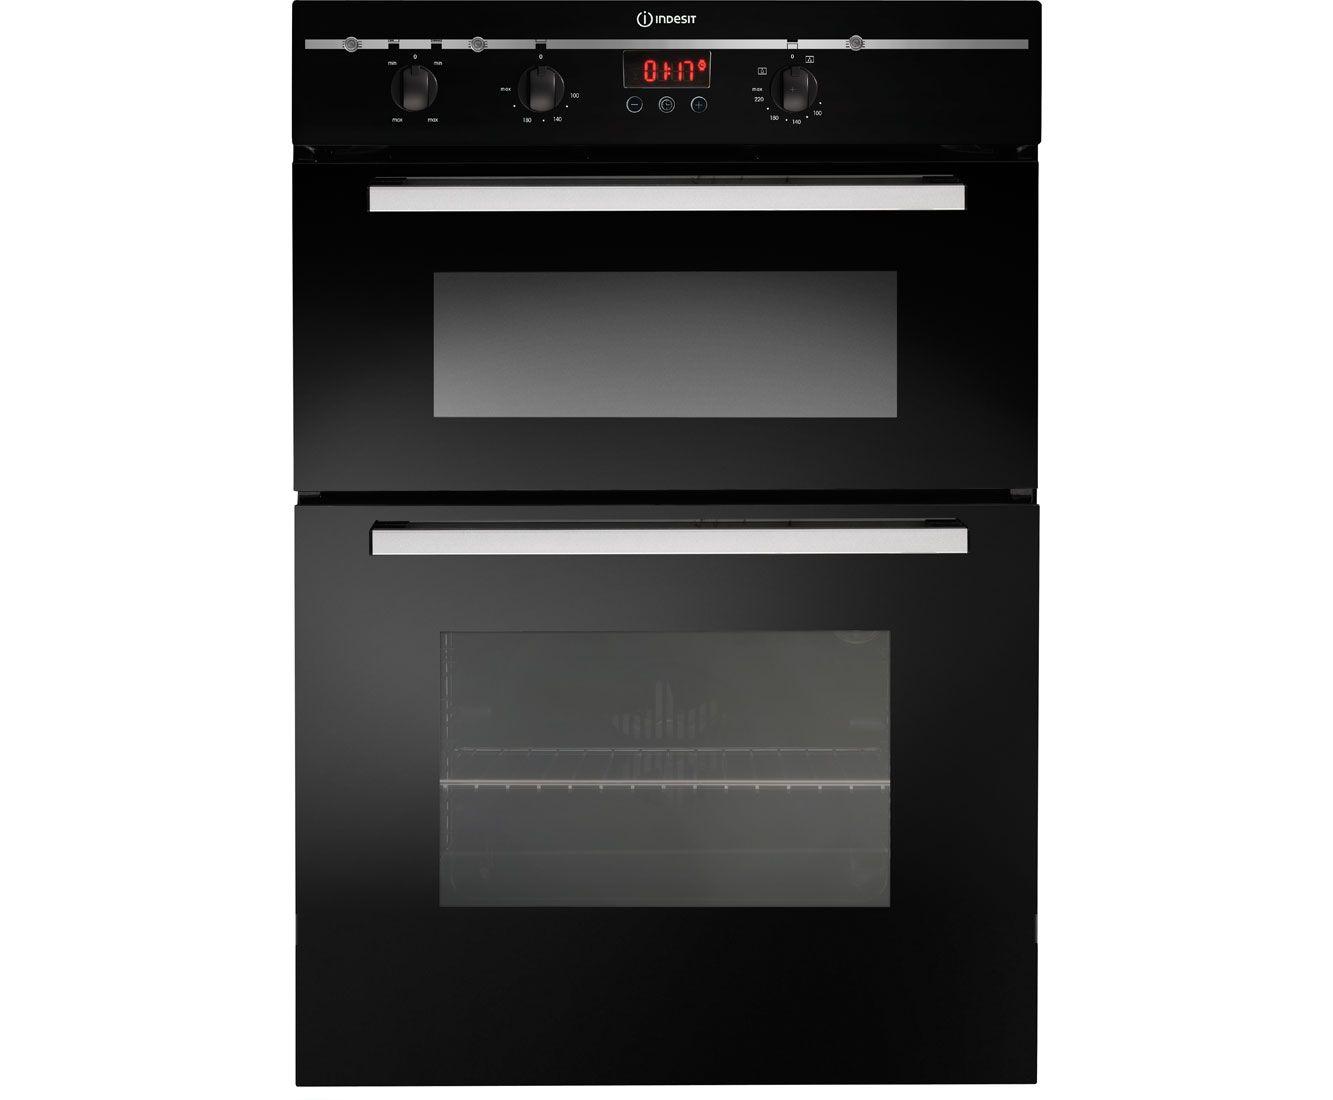 Indesit fimdbks built in double oven black appliances pinterest